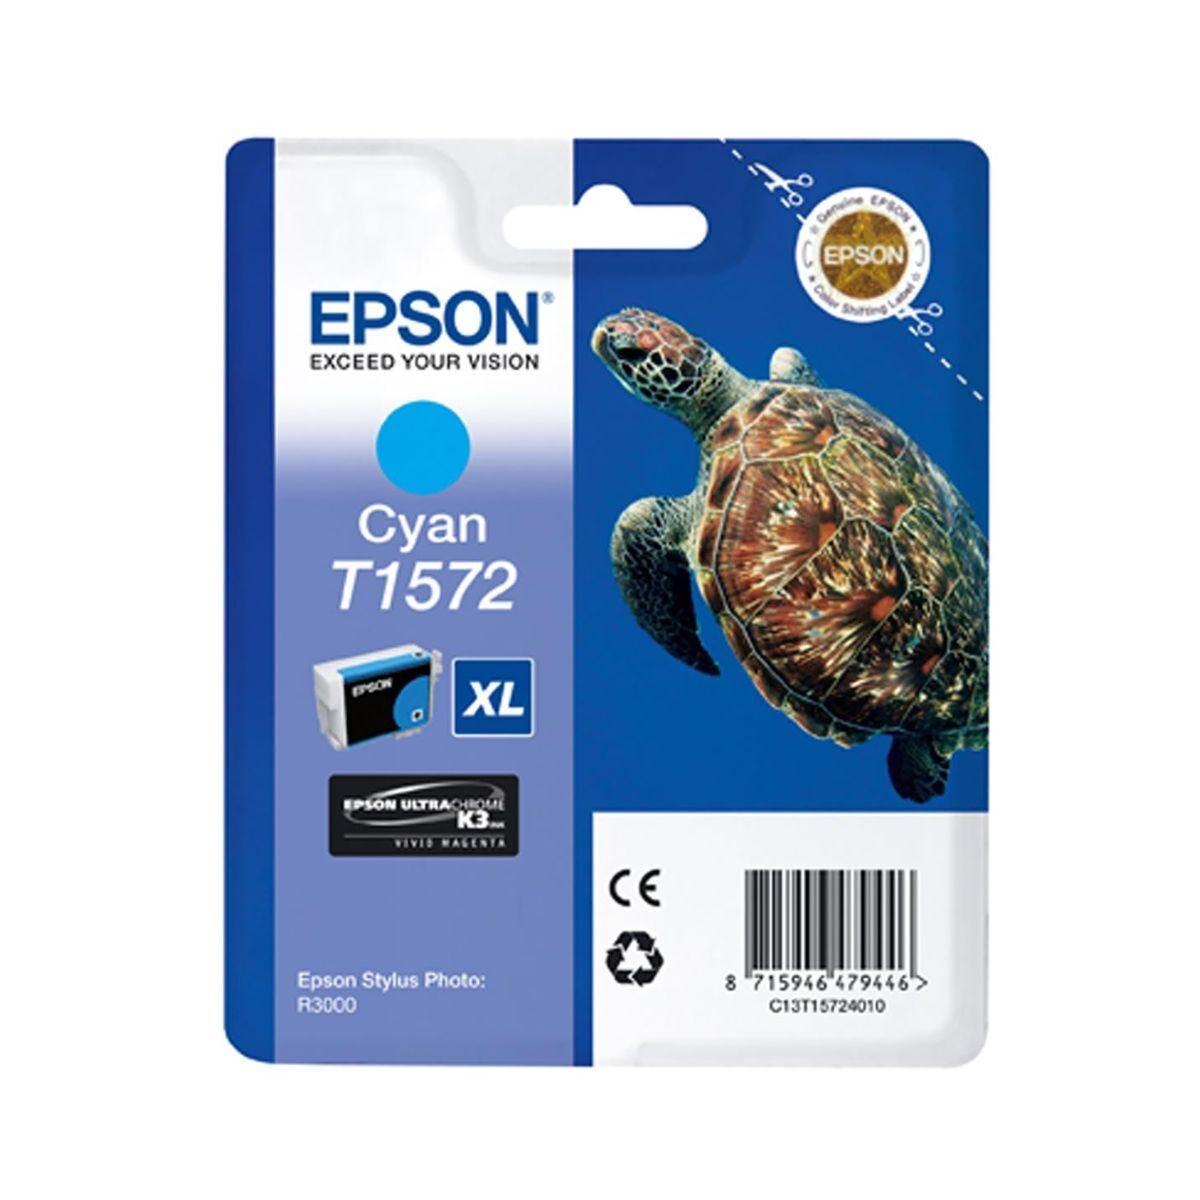 Epson R3000 Cyan Ink Cartridge